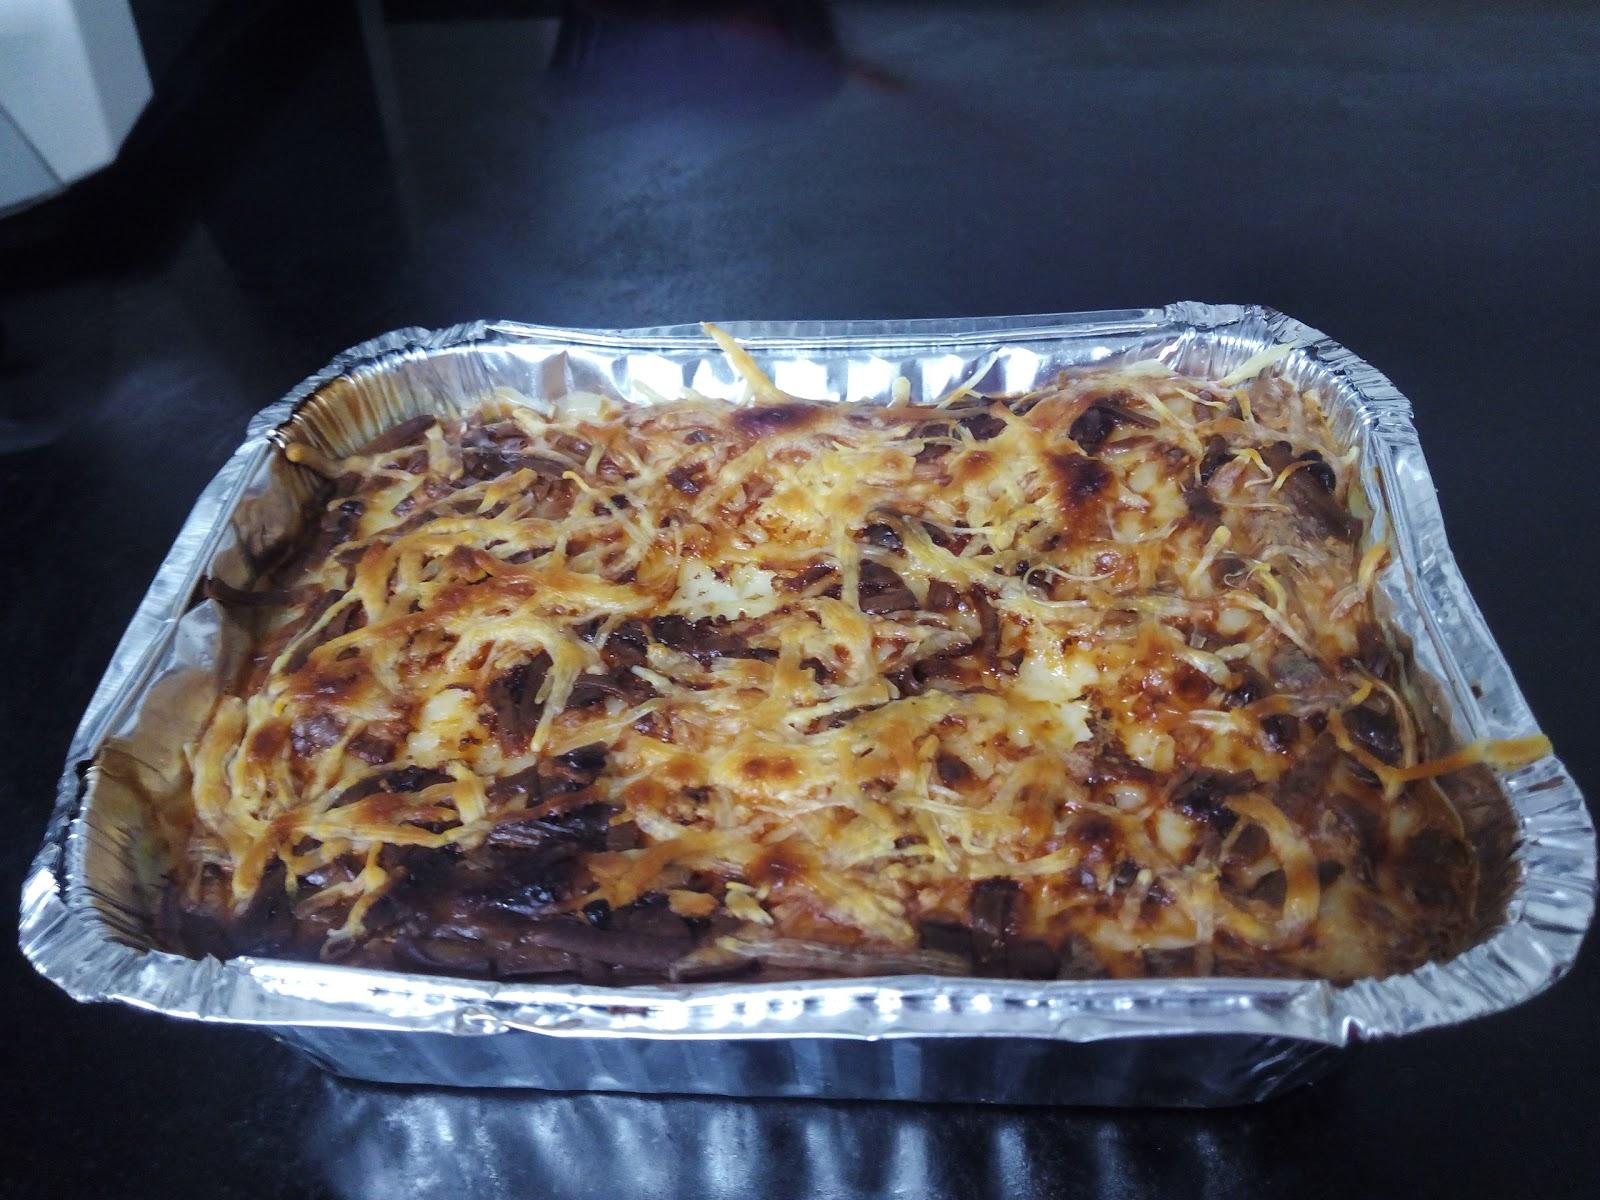 Cocina con rachel canelones caseros - Racholas cocina ...